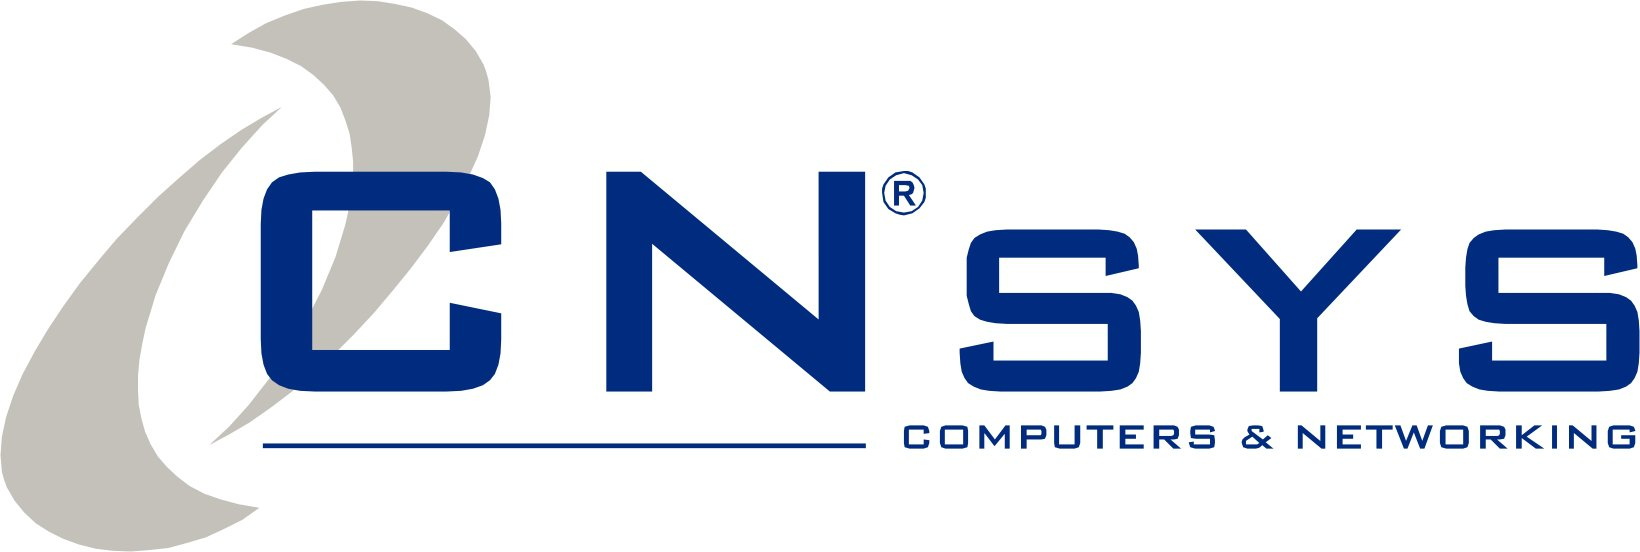 СИЕНСИС АД logo